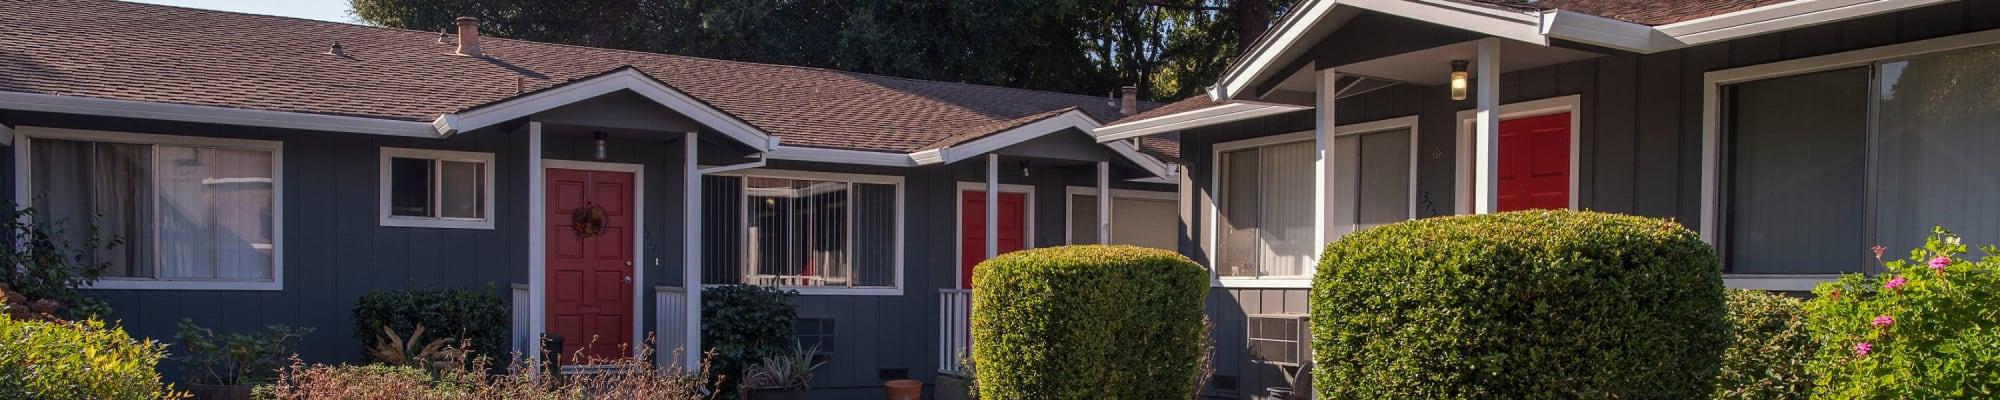 Community map at Spring Lake Apartment Homes in Santa Rosa, California